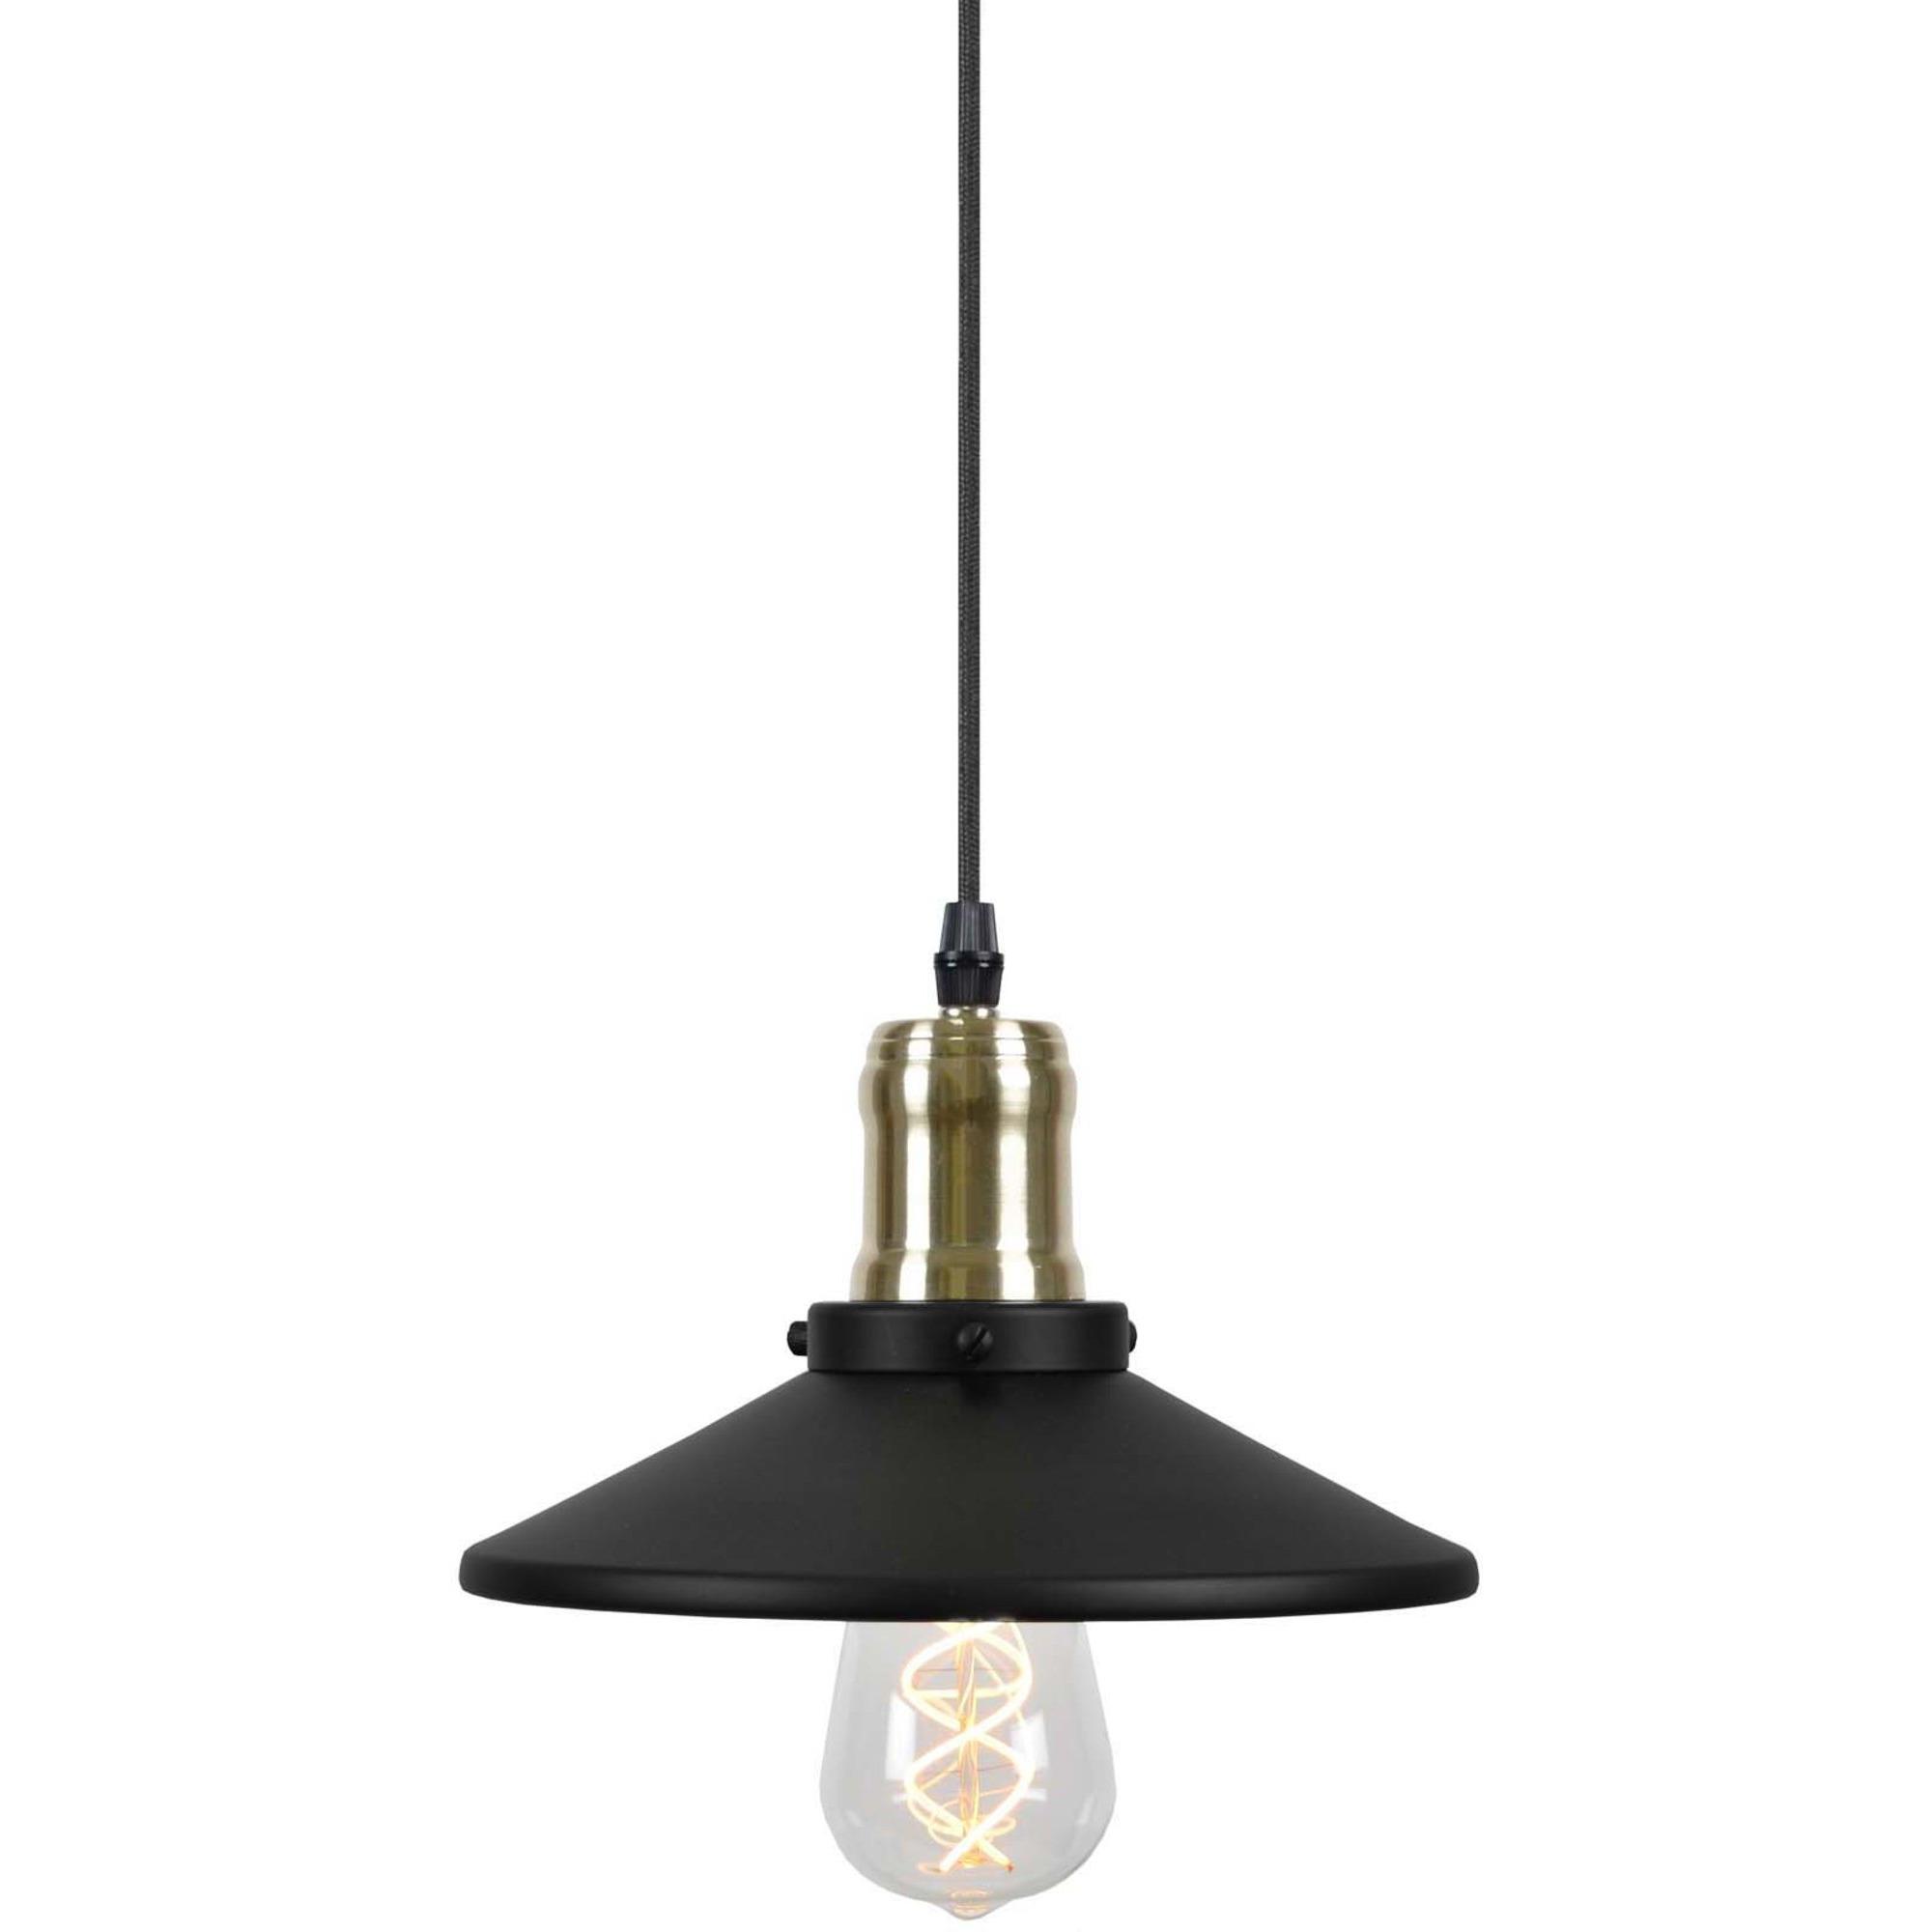 Globen Lighting Pendel Disc Mini Mattsvart / Borstad Mässing